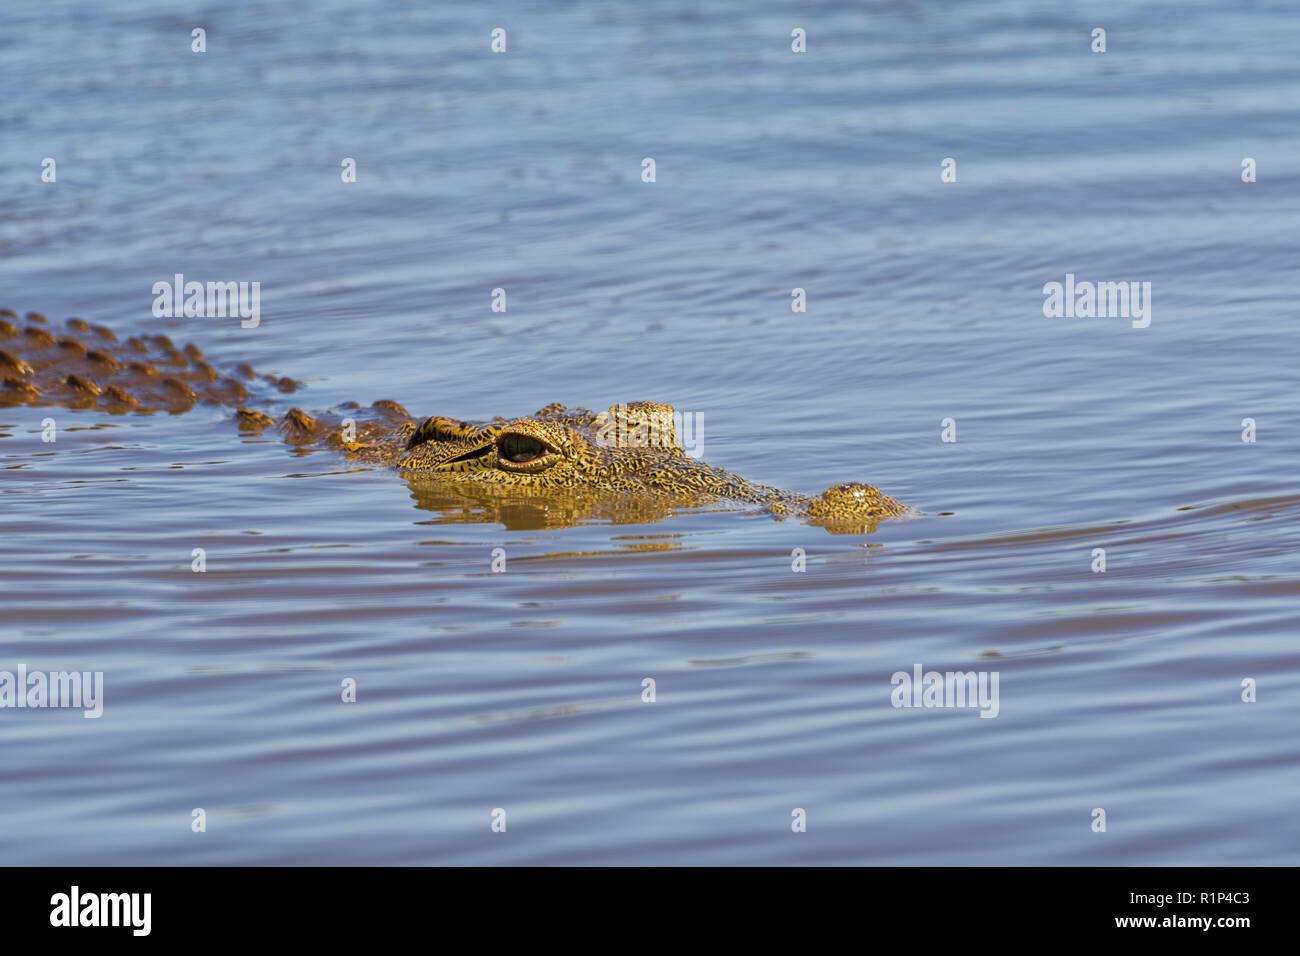 Nile crocodile (Crocodylus niloticus) in water, Sunset Dam, Kruger National Park, Mpumalanga, South Africa, Africa - Stock Photo